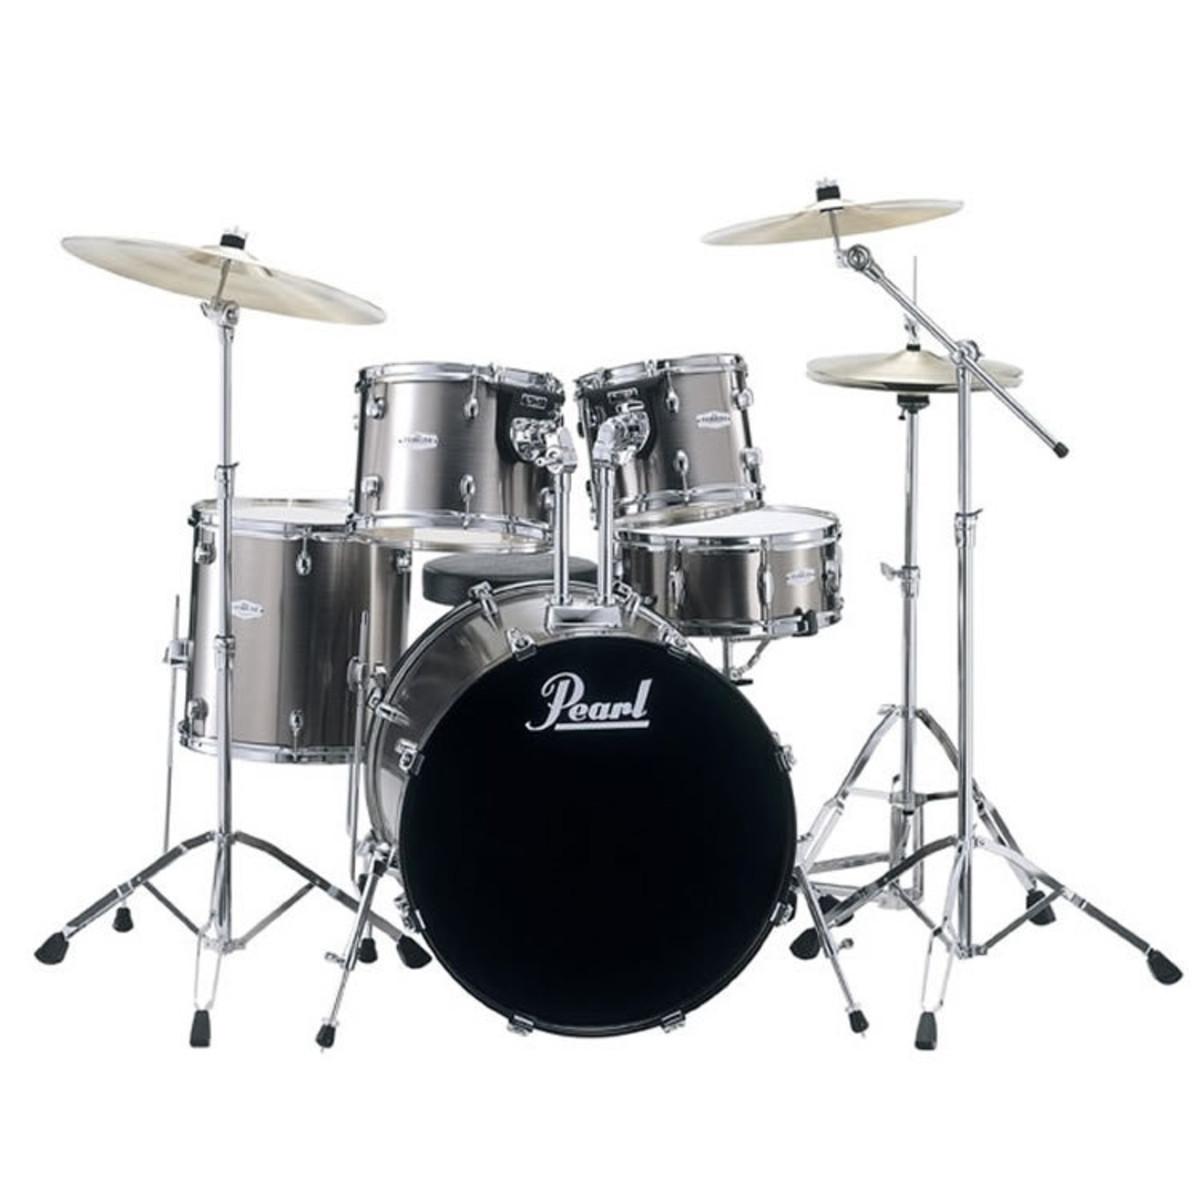 DISC Pearl FZ725 Forum Drum Kit, - 117.3KB